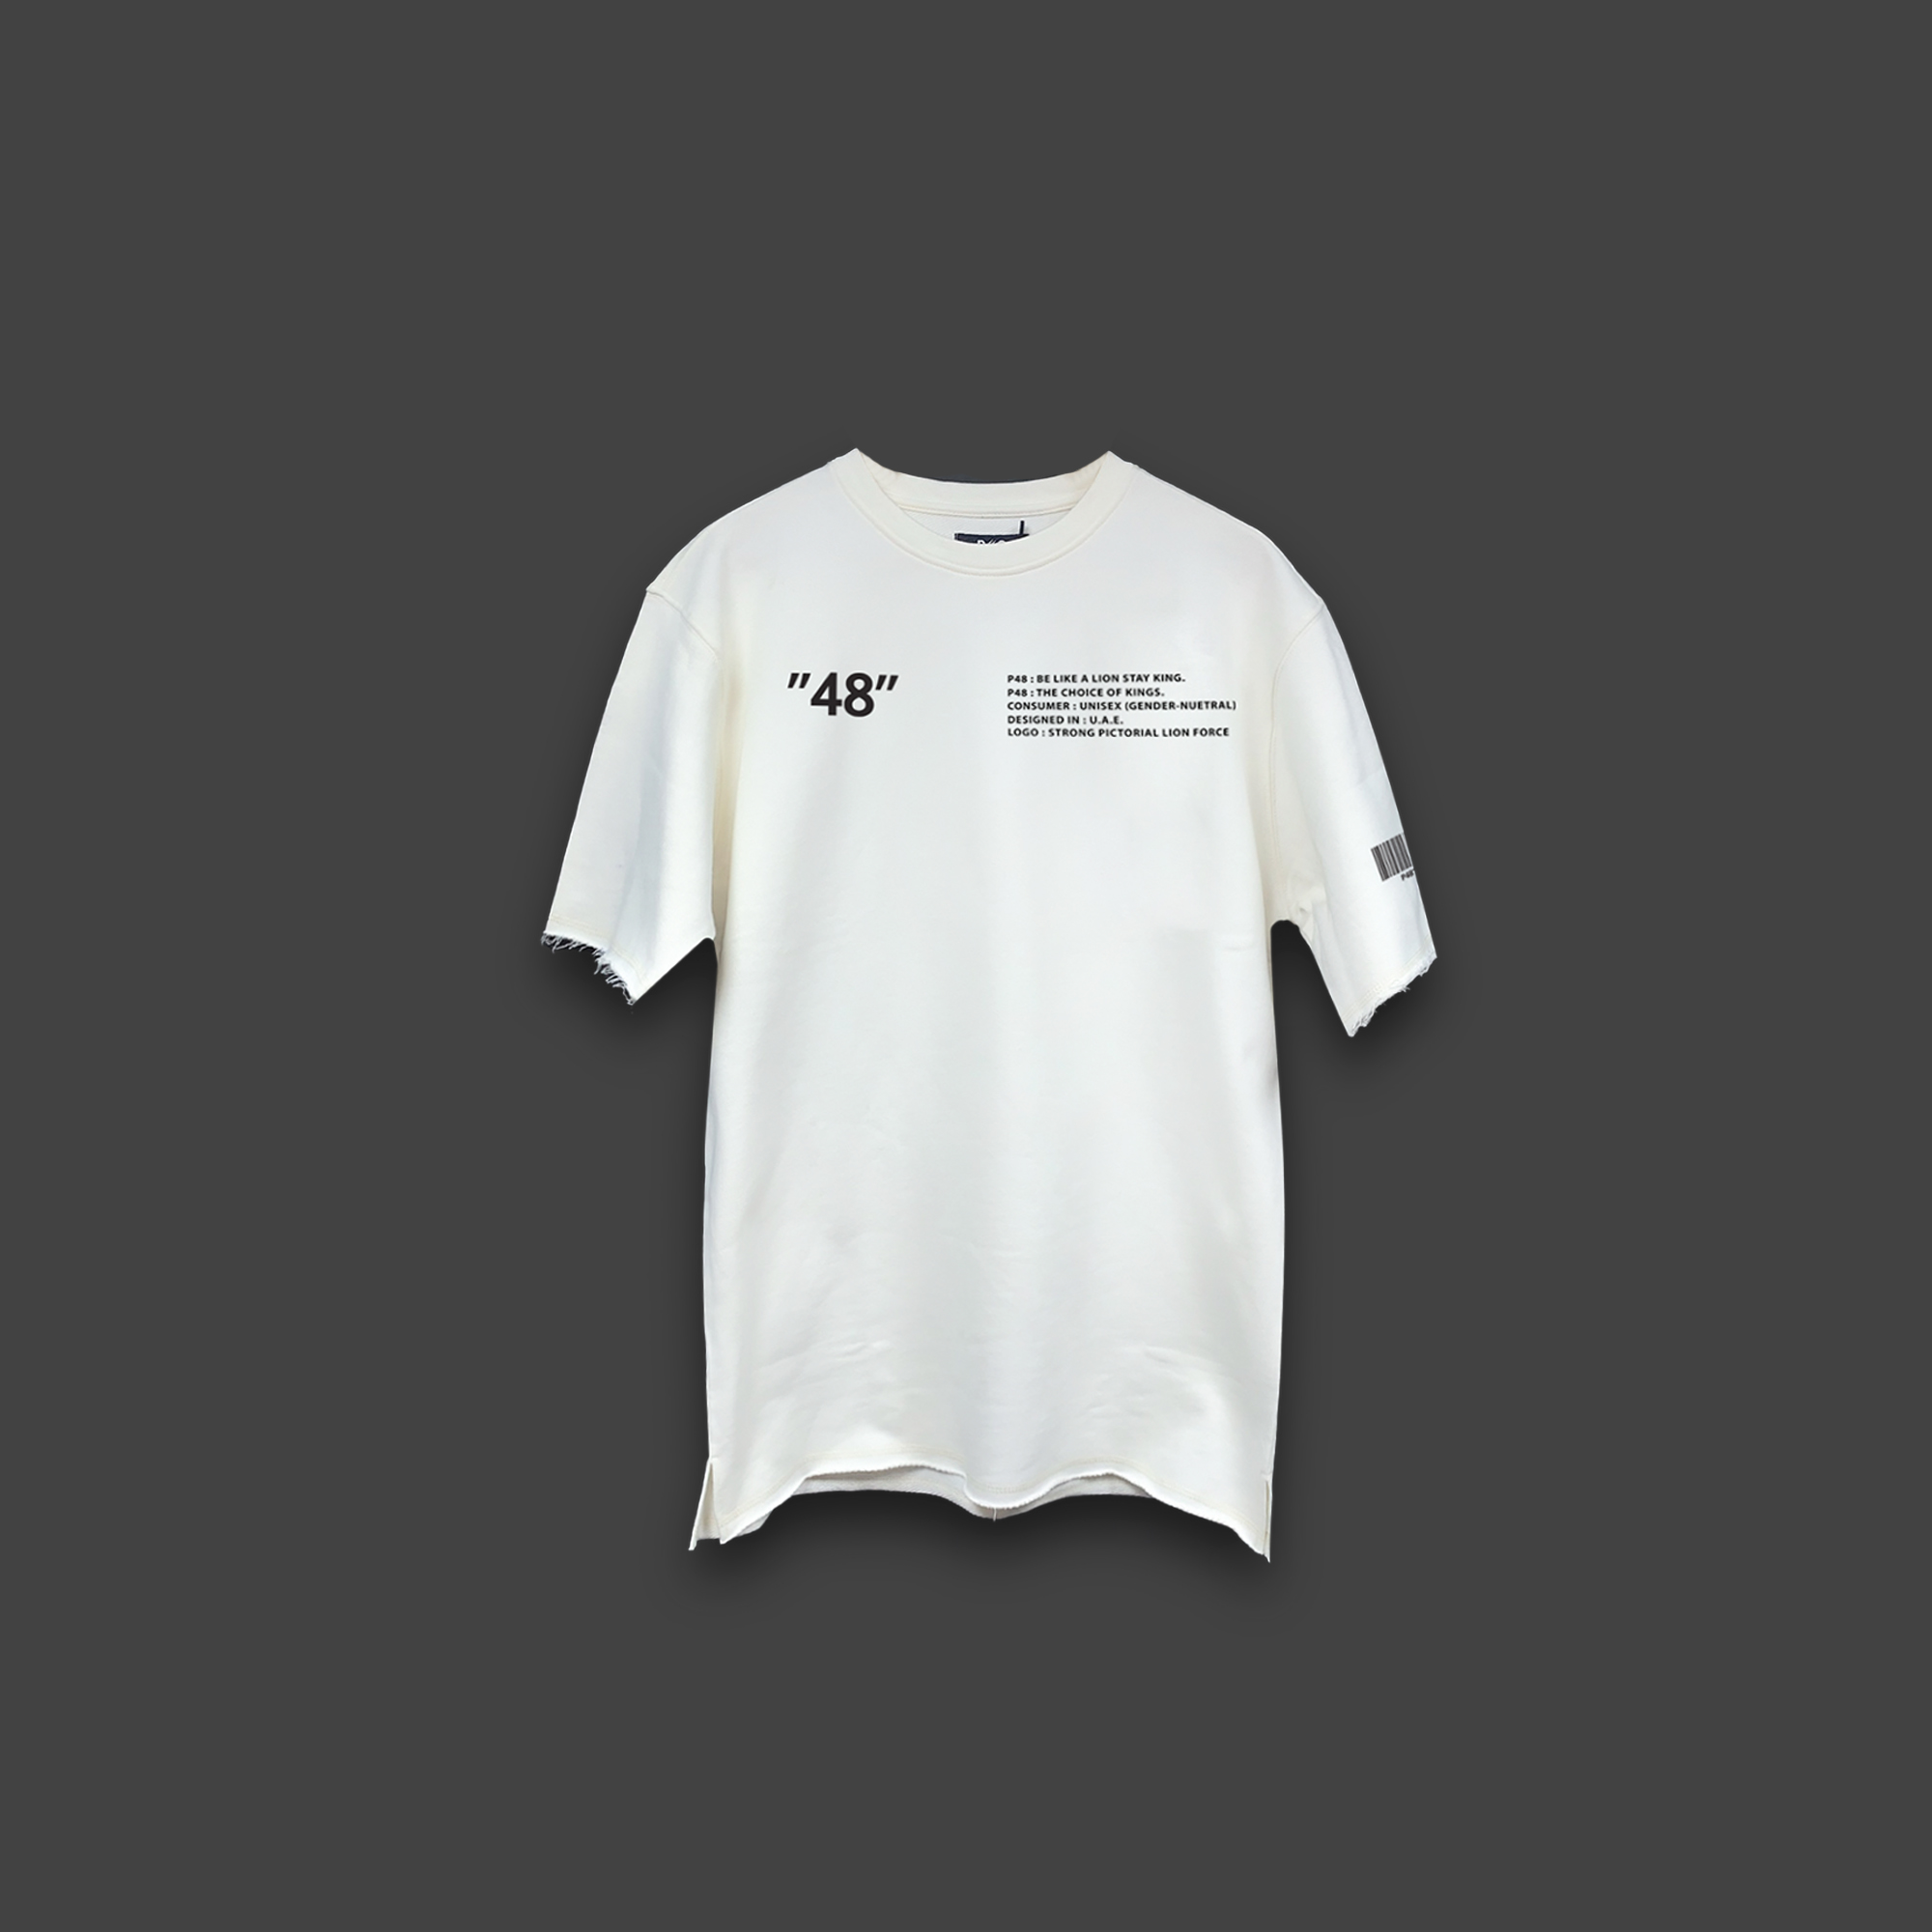 48 OVERSIZED T-SHIRT - Off-white